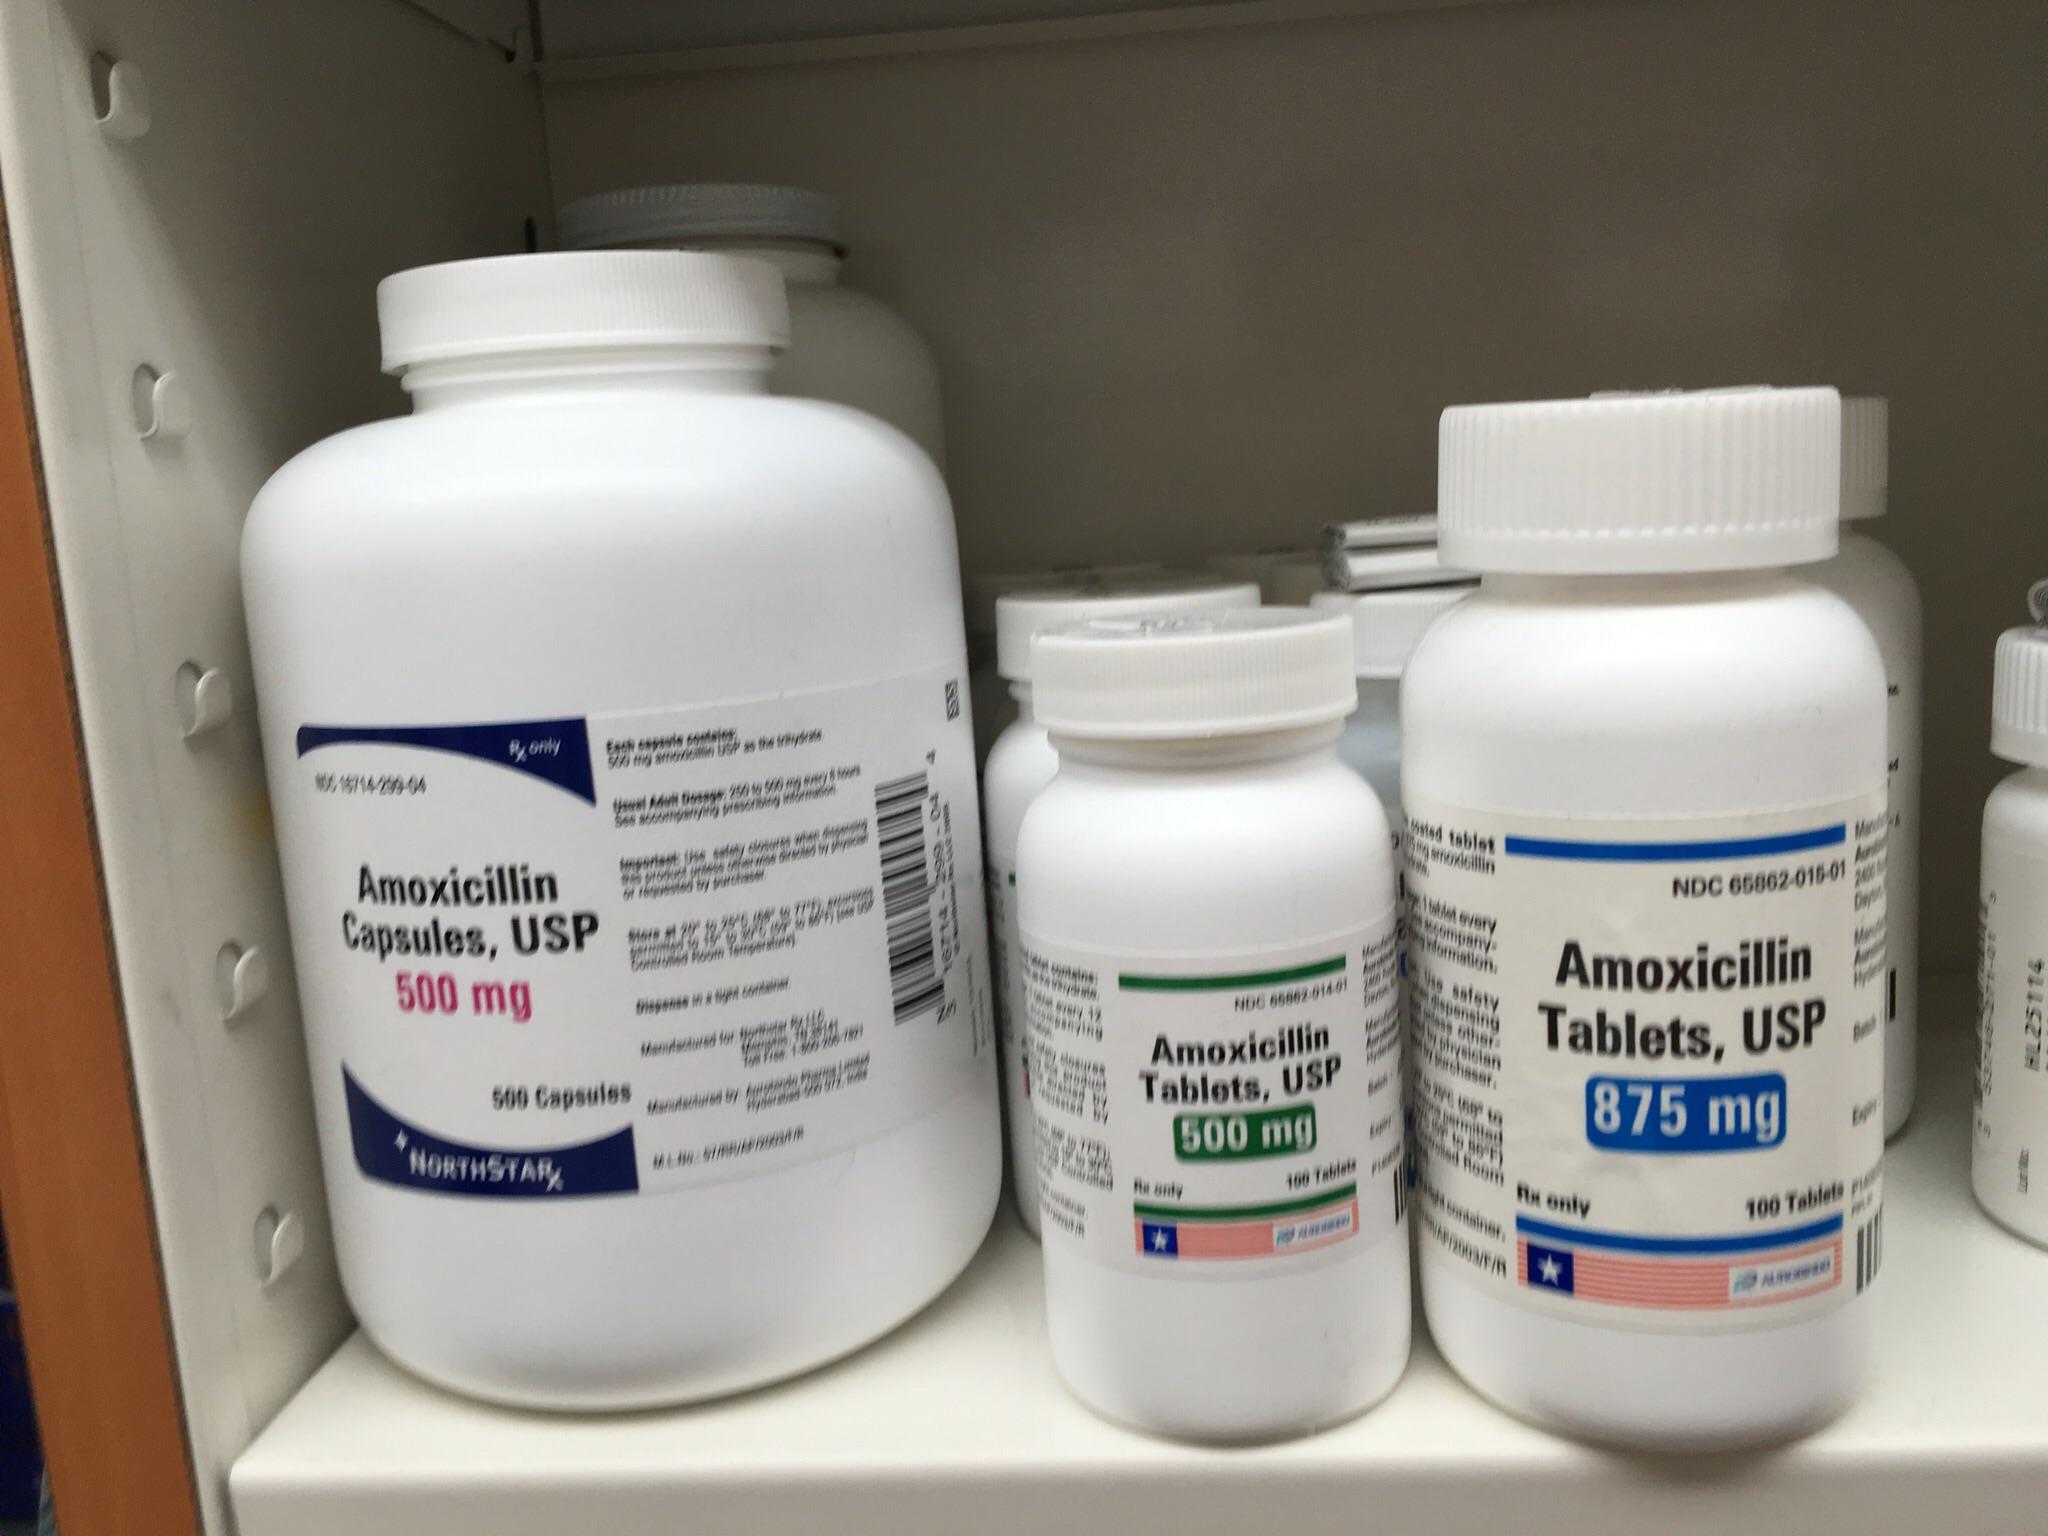 amoxicillin tablets dosage forms